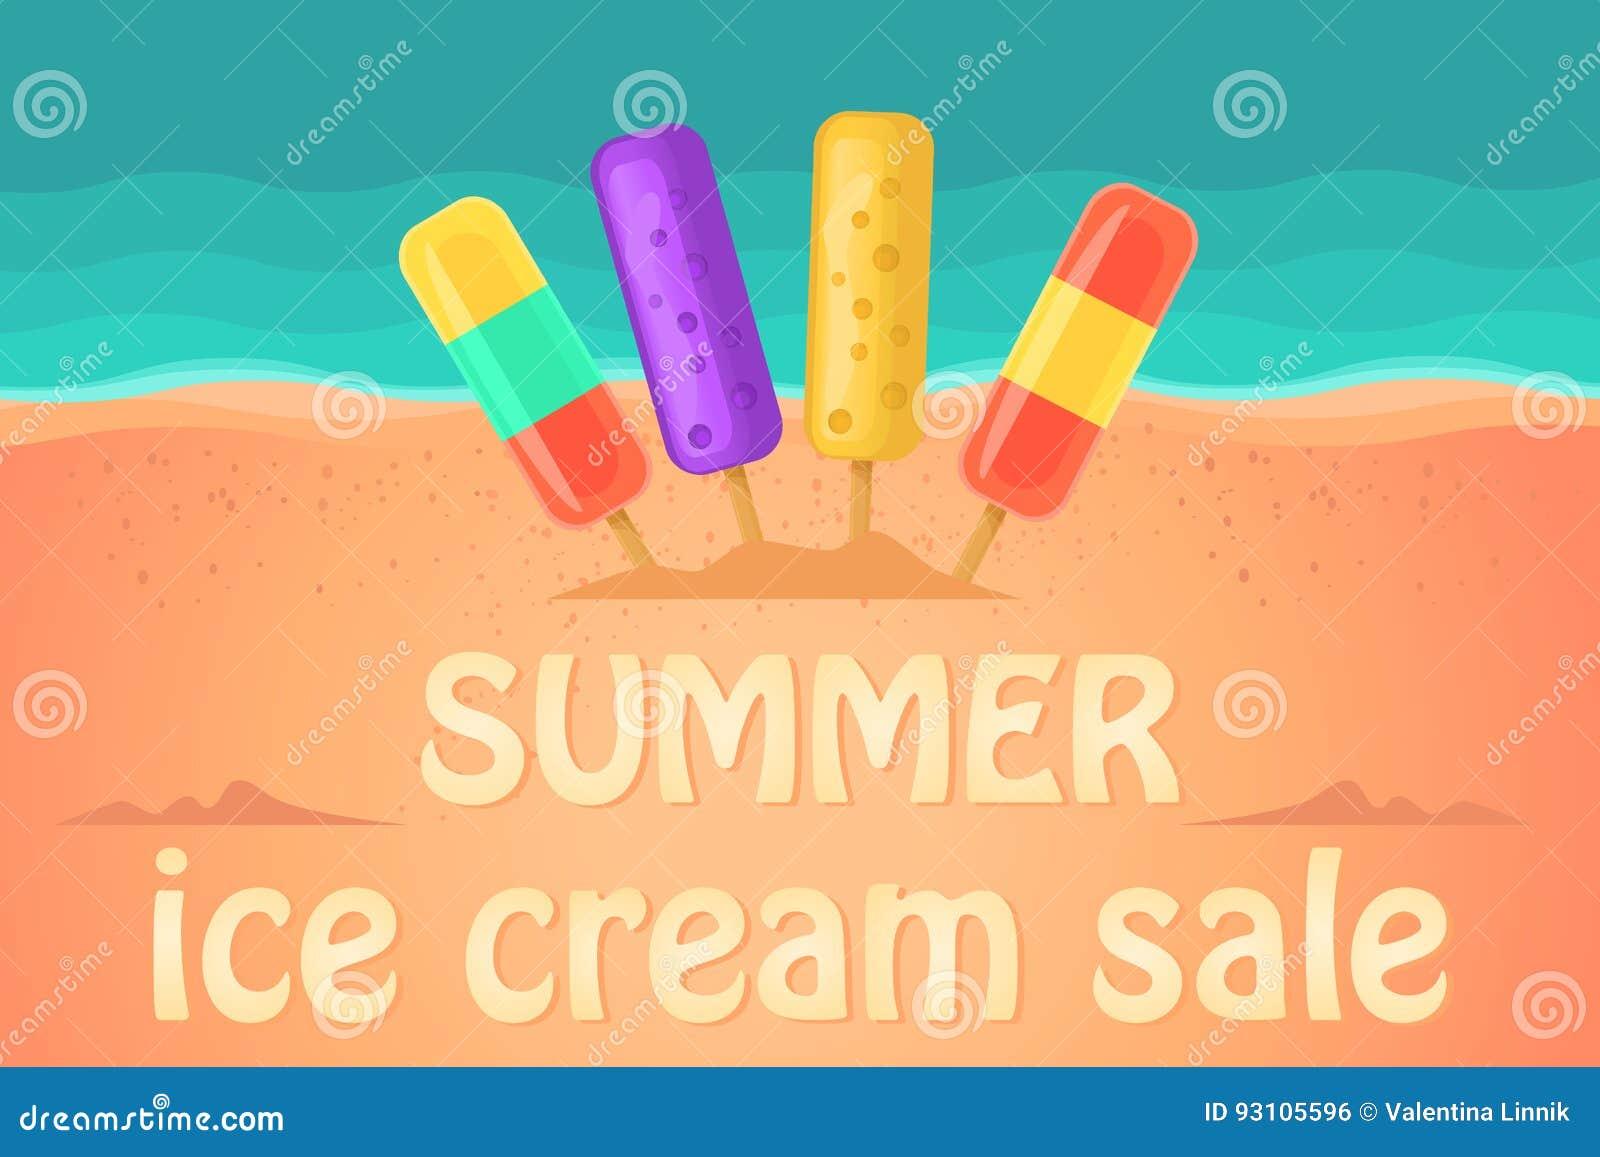 Ice Cream Shop On The Beach Vector Illustration